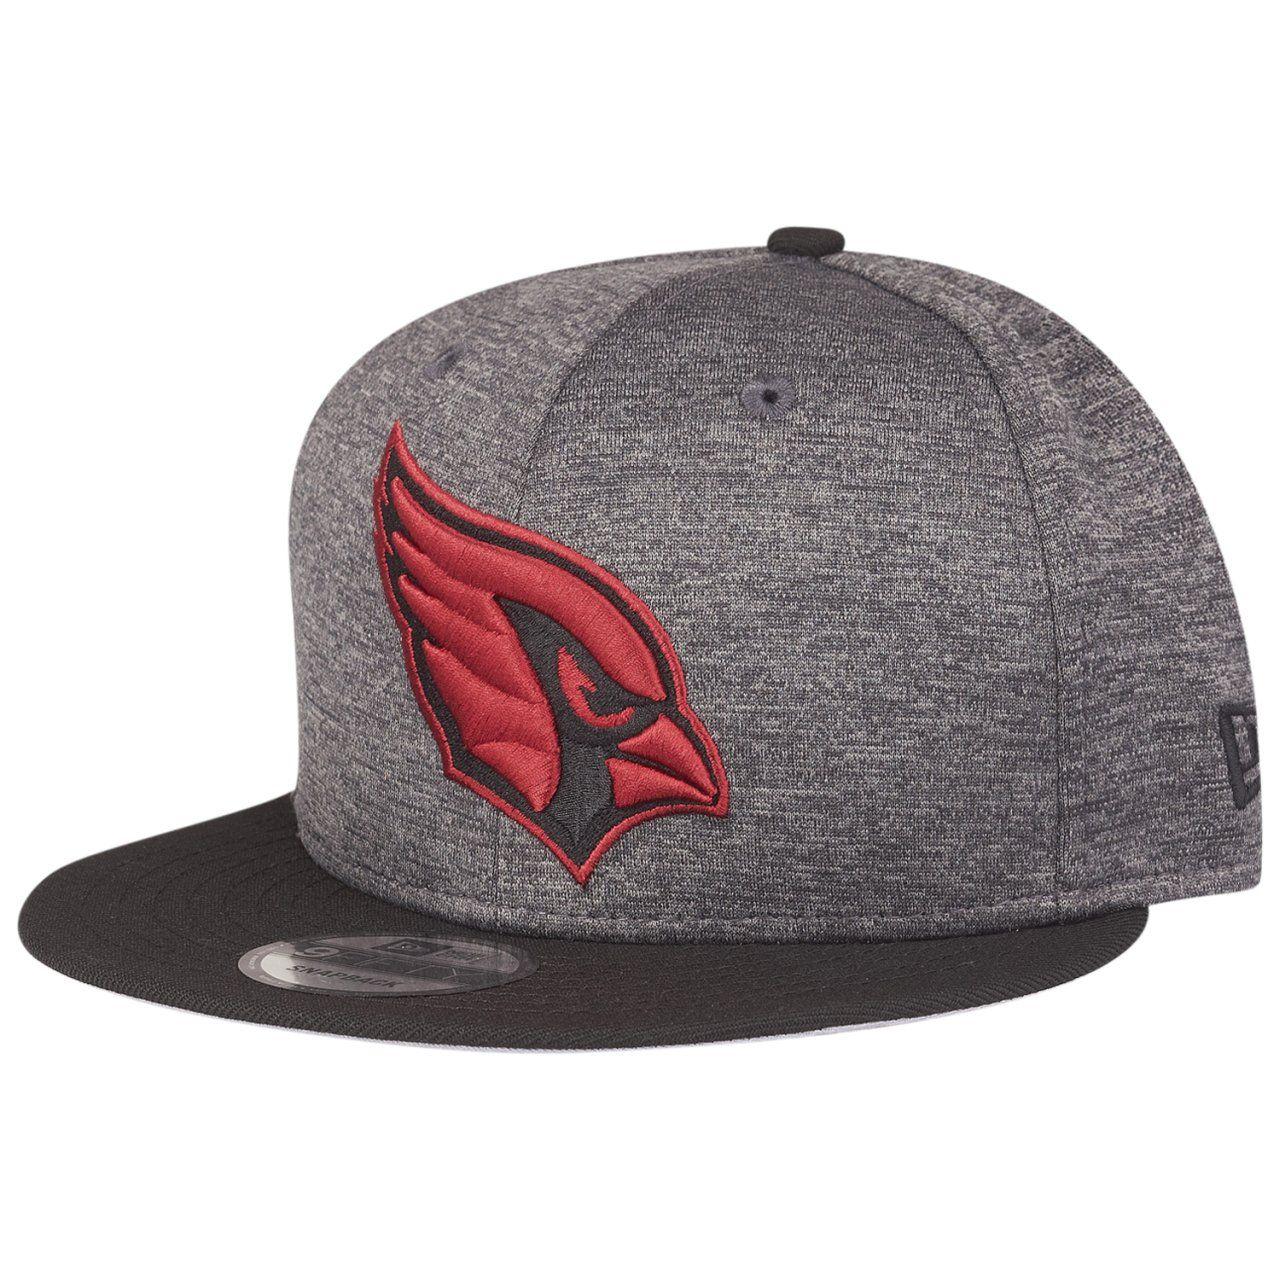 amfoo - New Era 9Fifty Snapback Cap - SHADOW TECH Arizona Cardinals